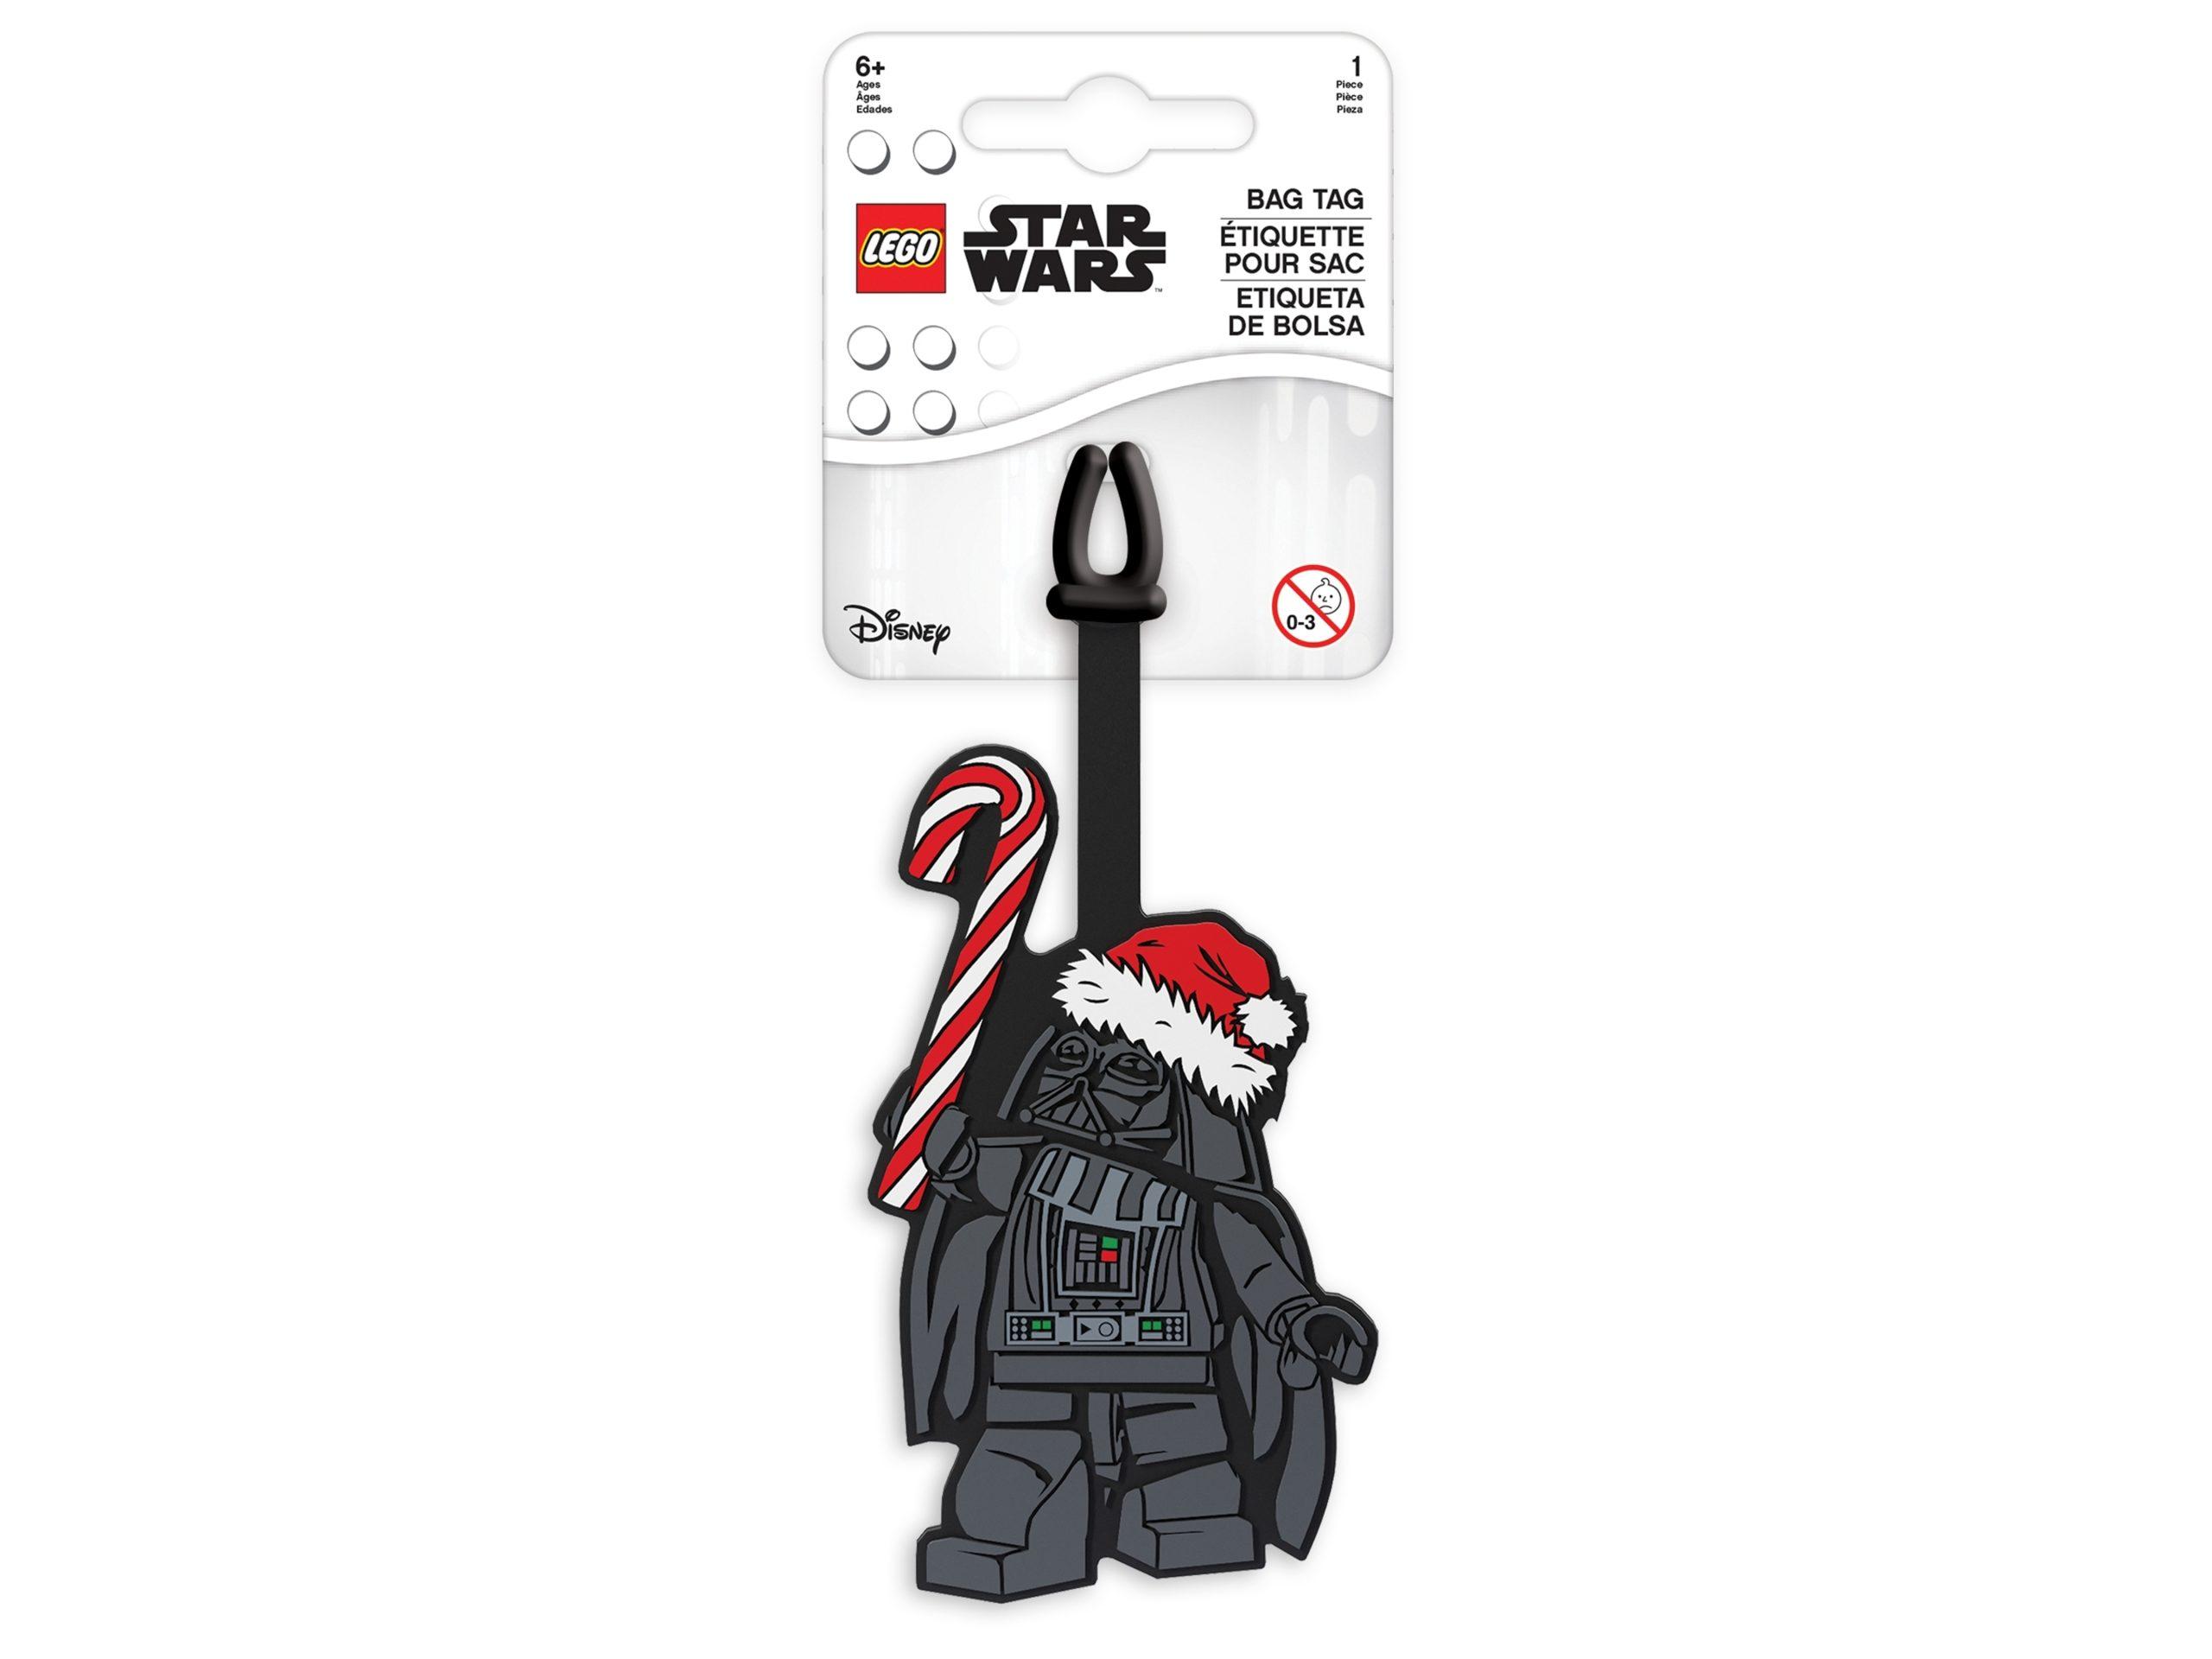 LEGO 5006033 sale - Holiday Bag Tag